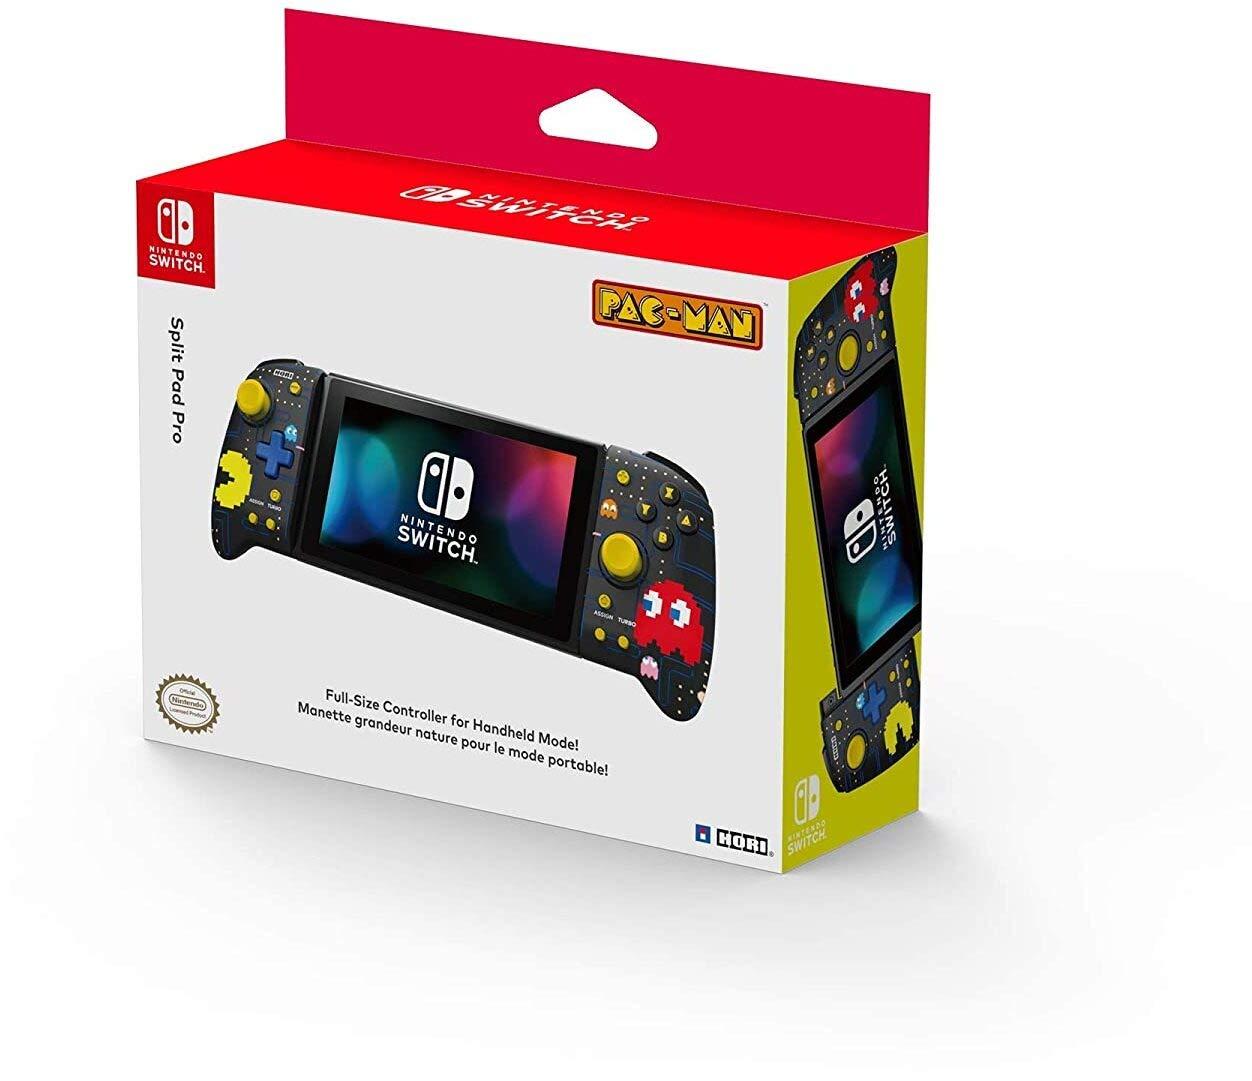 Hori Nintendo Switch Split Pad Pro (Pac-Man) Ergonomic Controller for Handheld Mode - Officially Licensed By Nintendo and Namco - Nintendo Switch